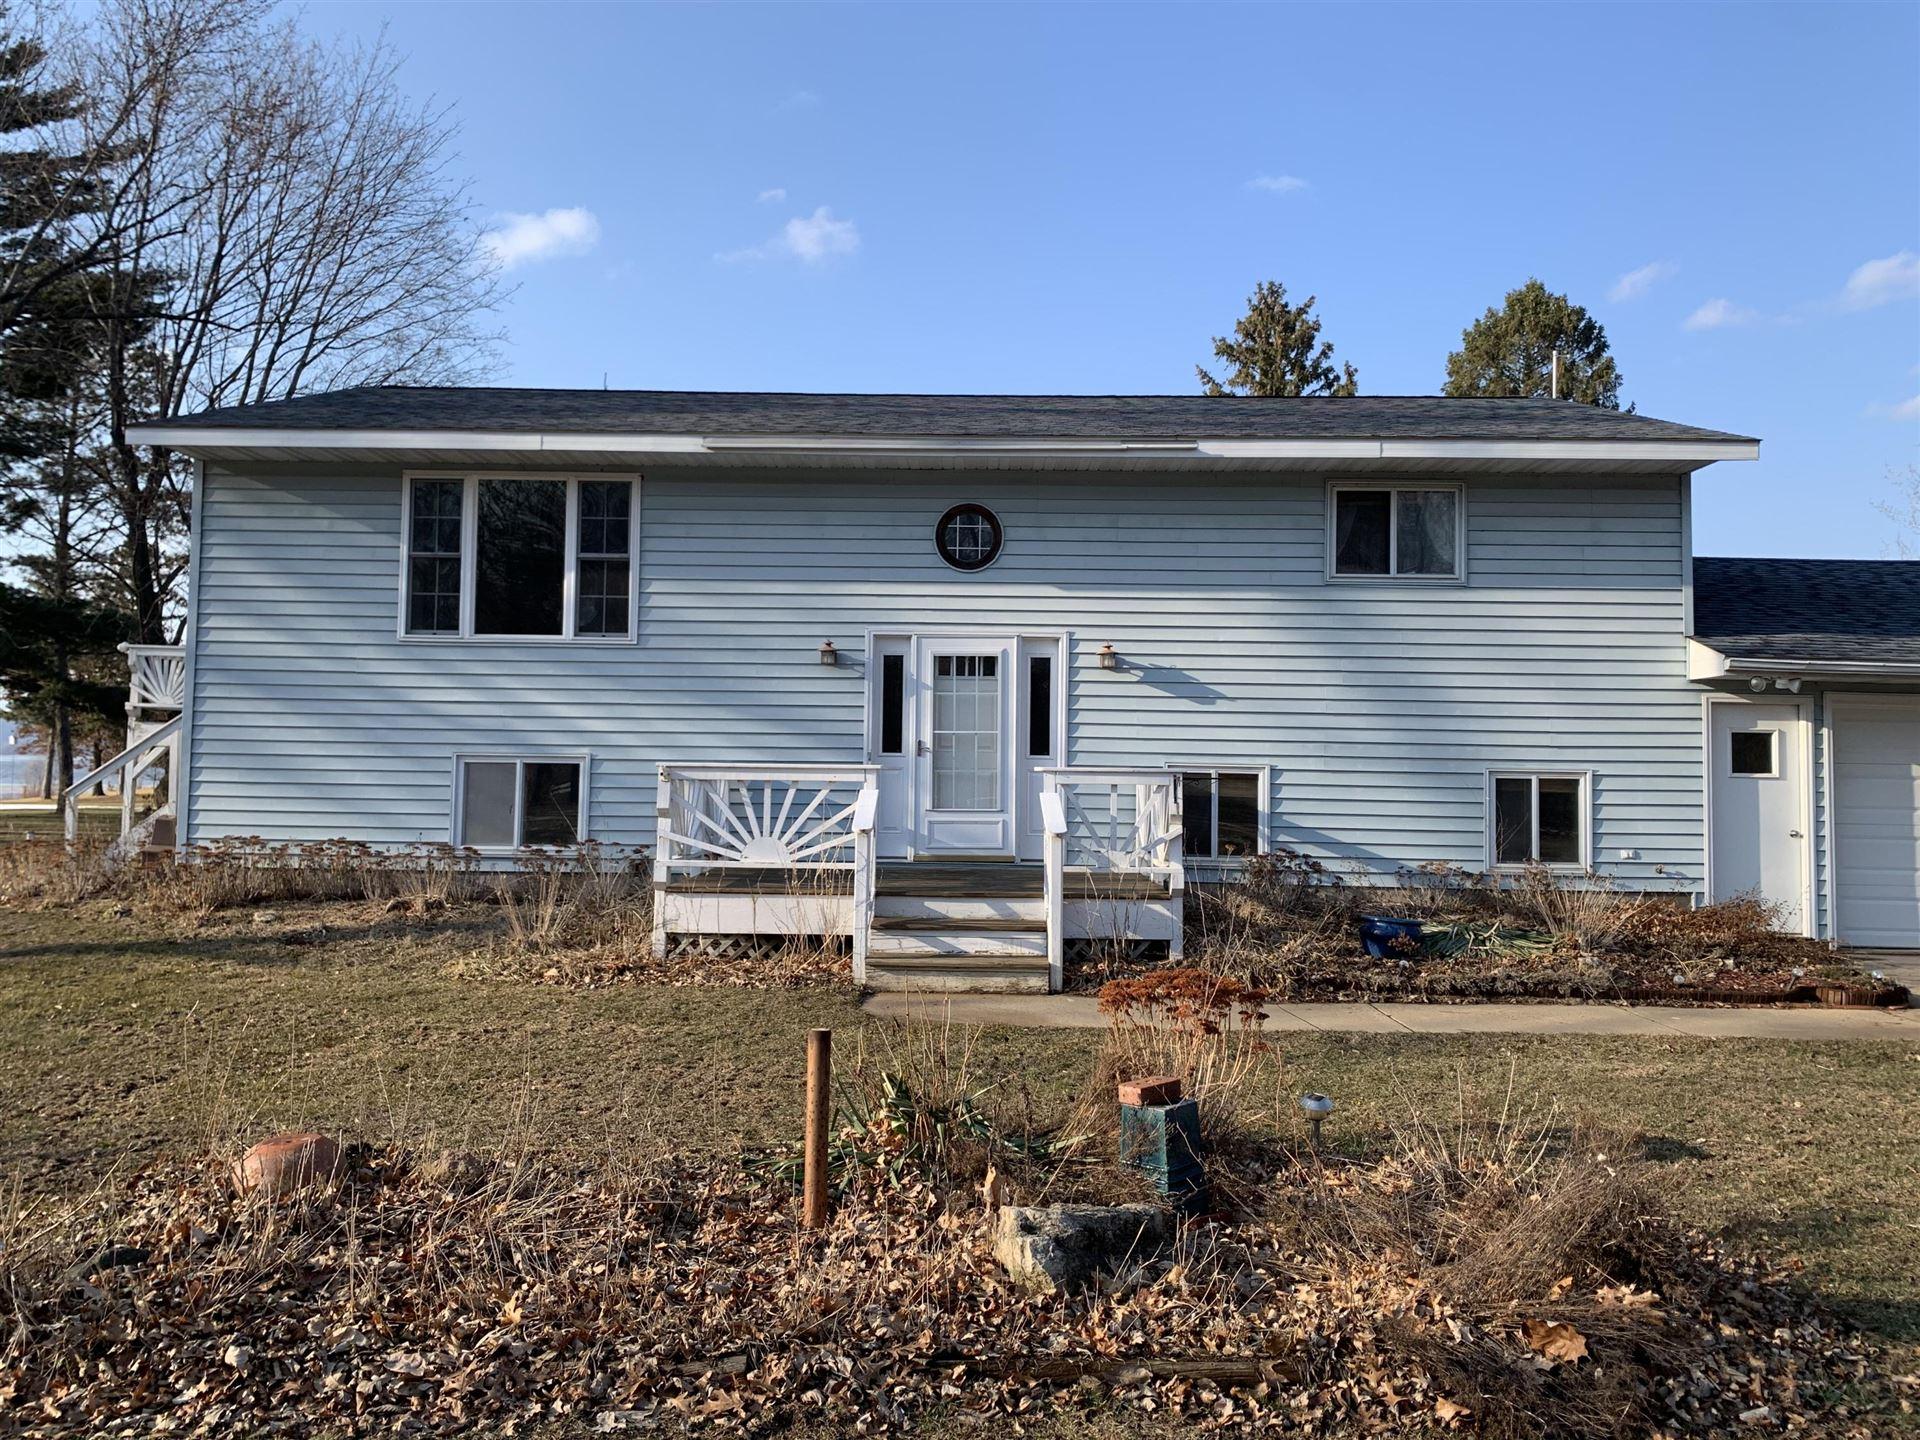 N1553 Cottage Ln, Stoddard, WI 54658 - MLS#: 1733830